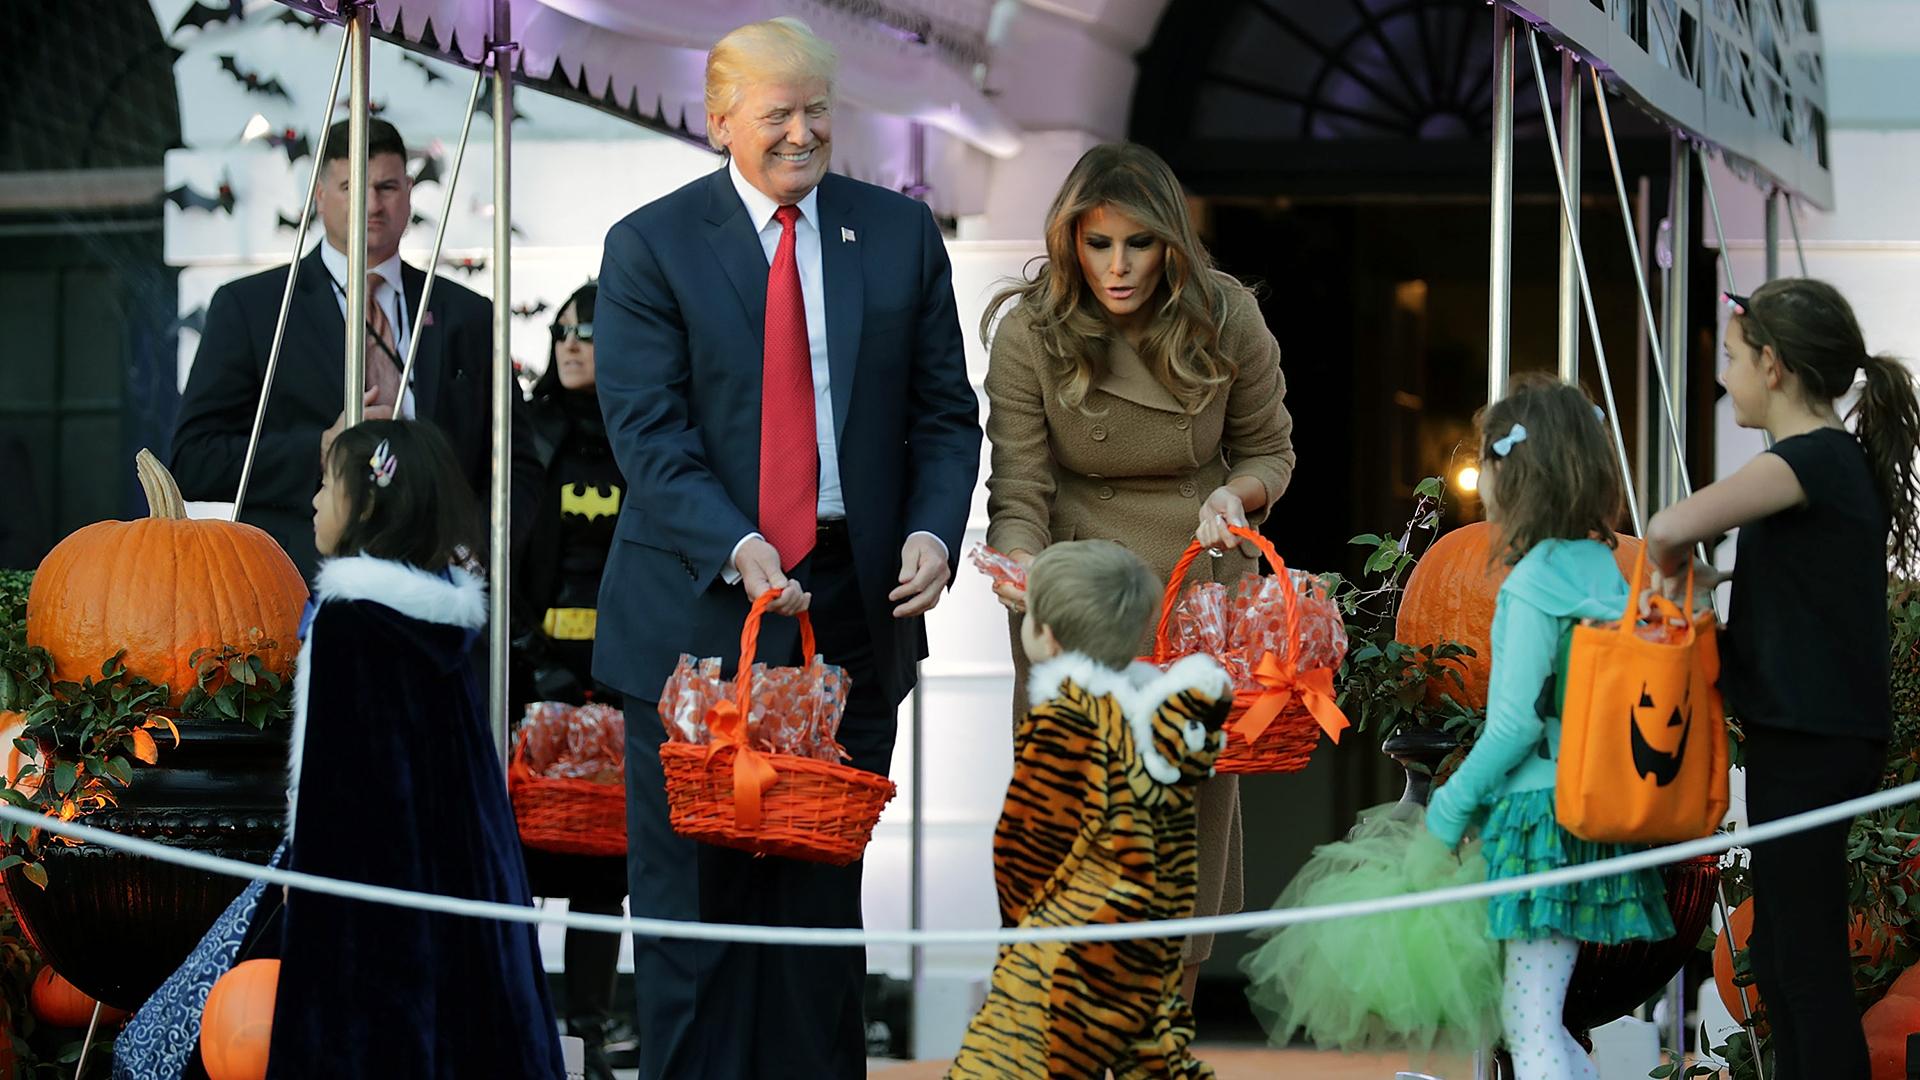 White House Halloween 2017 6-159532.jpg90980689